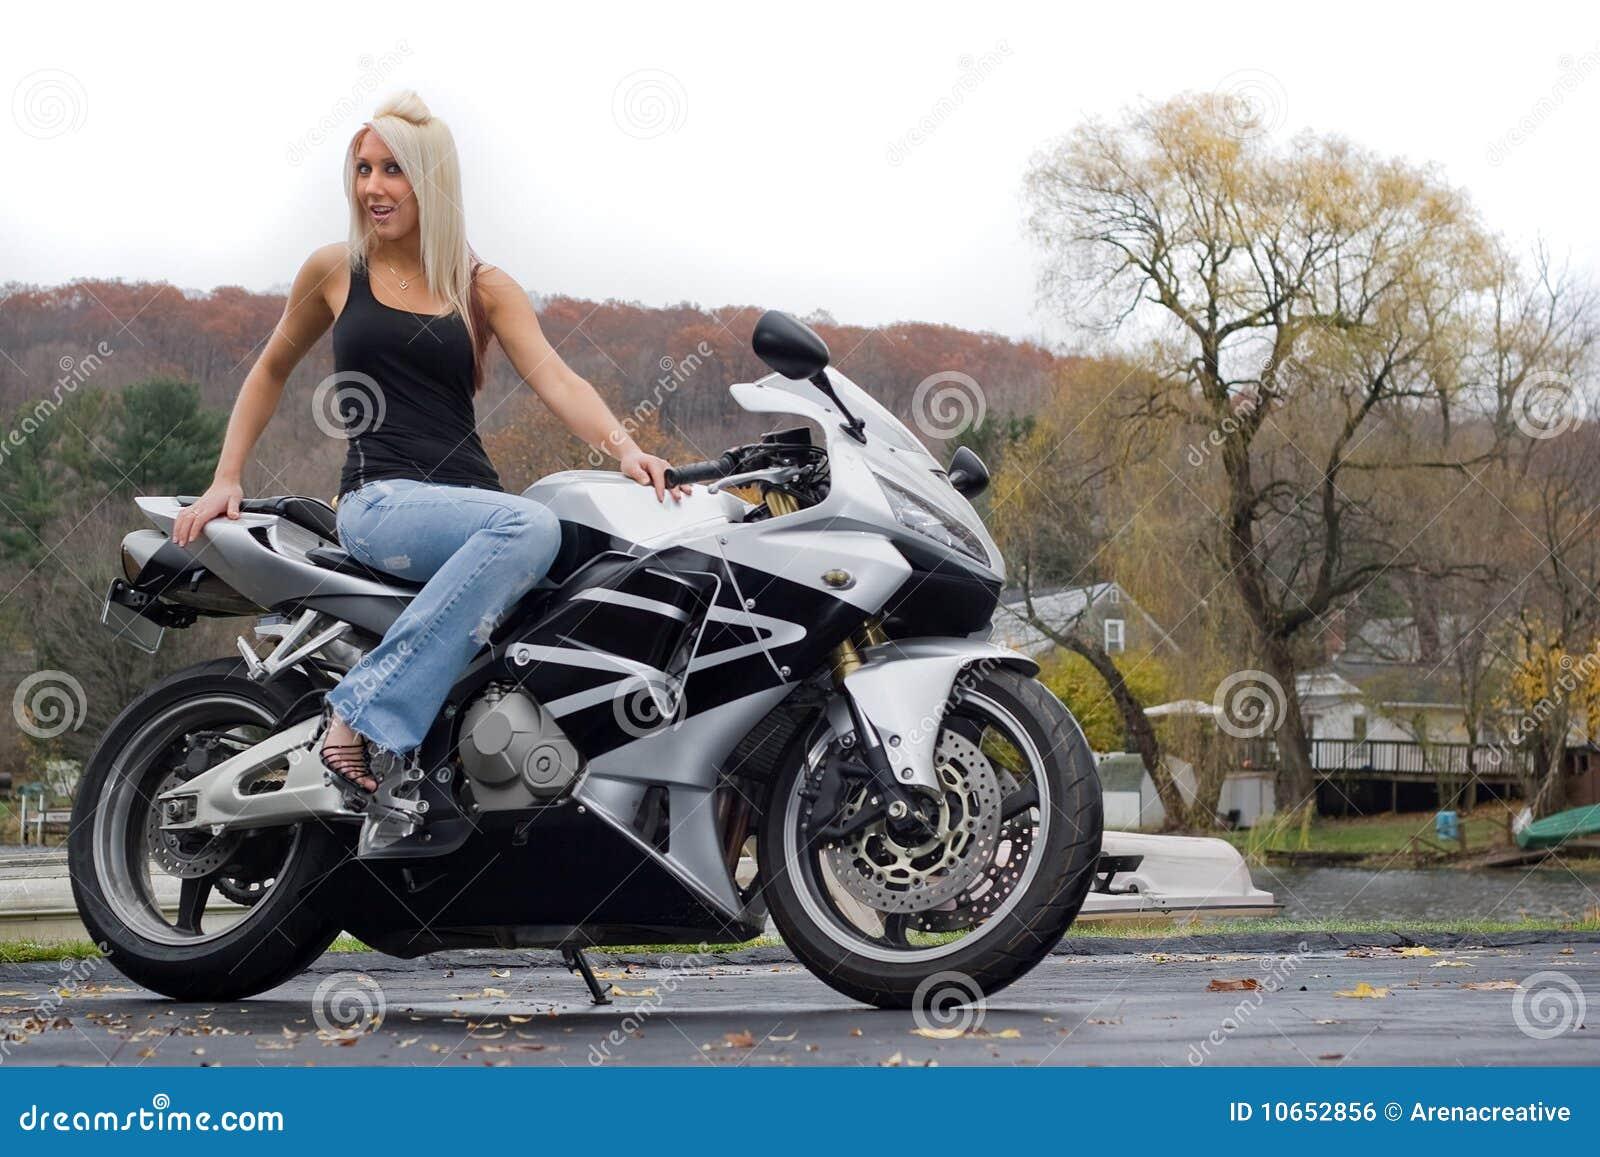 Single frauen motorrad Motorrad single frauen, Suche Single Frau Mit Motorrad